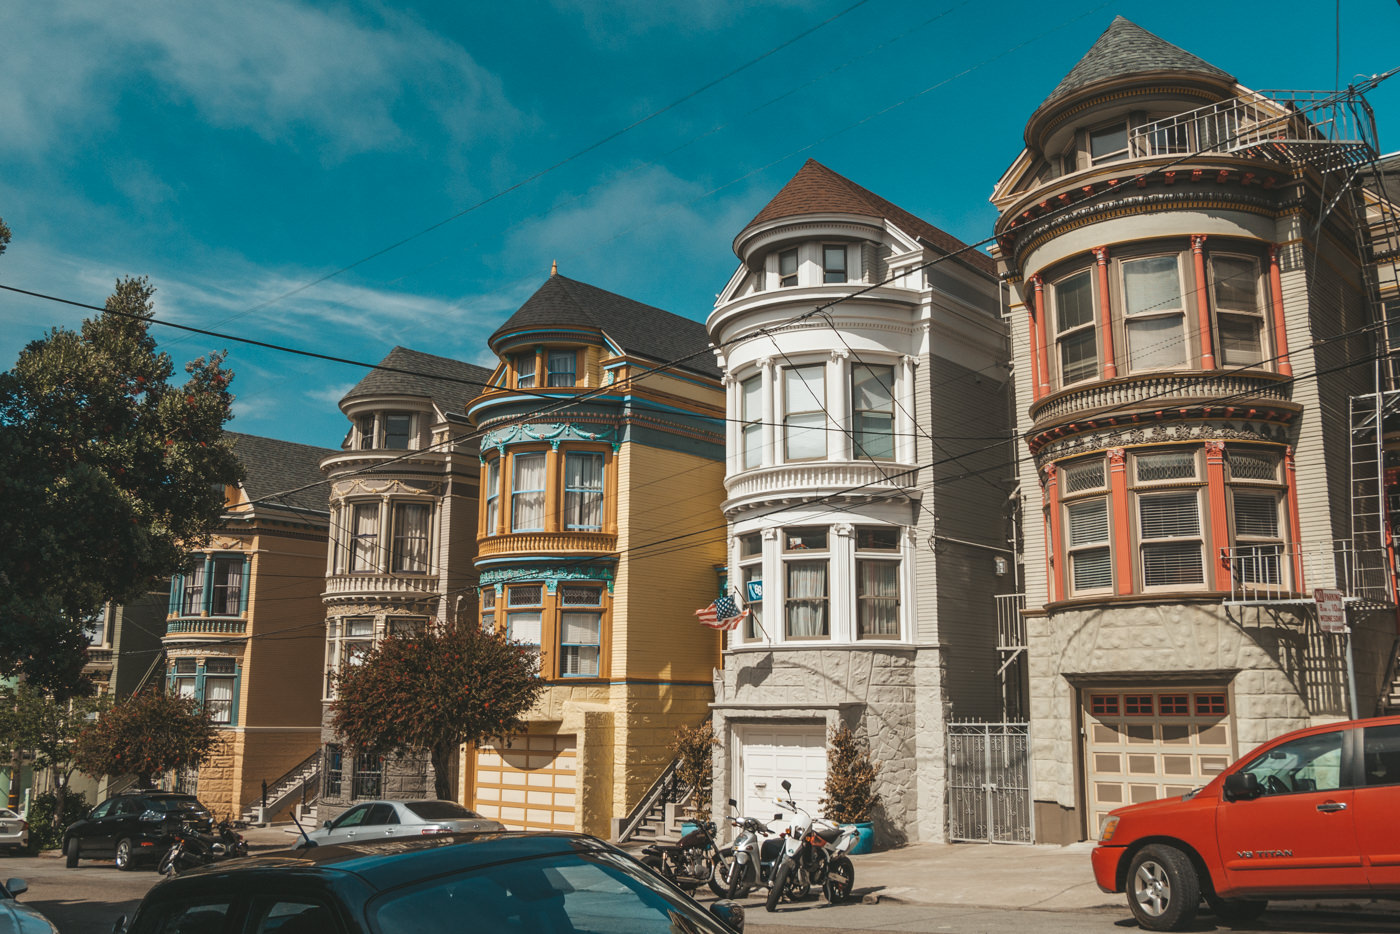 Häuser in San Francisco